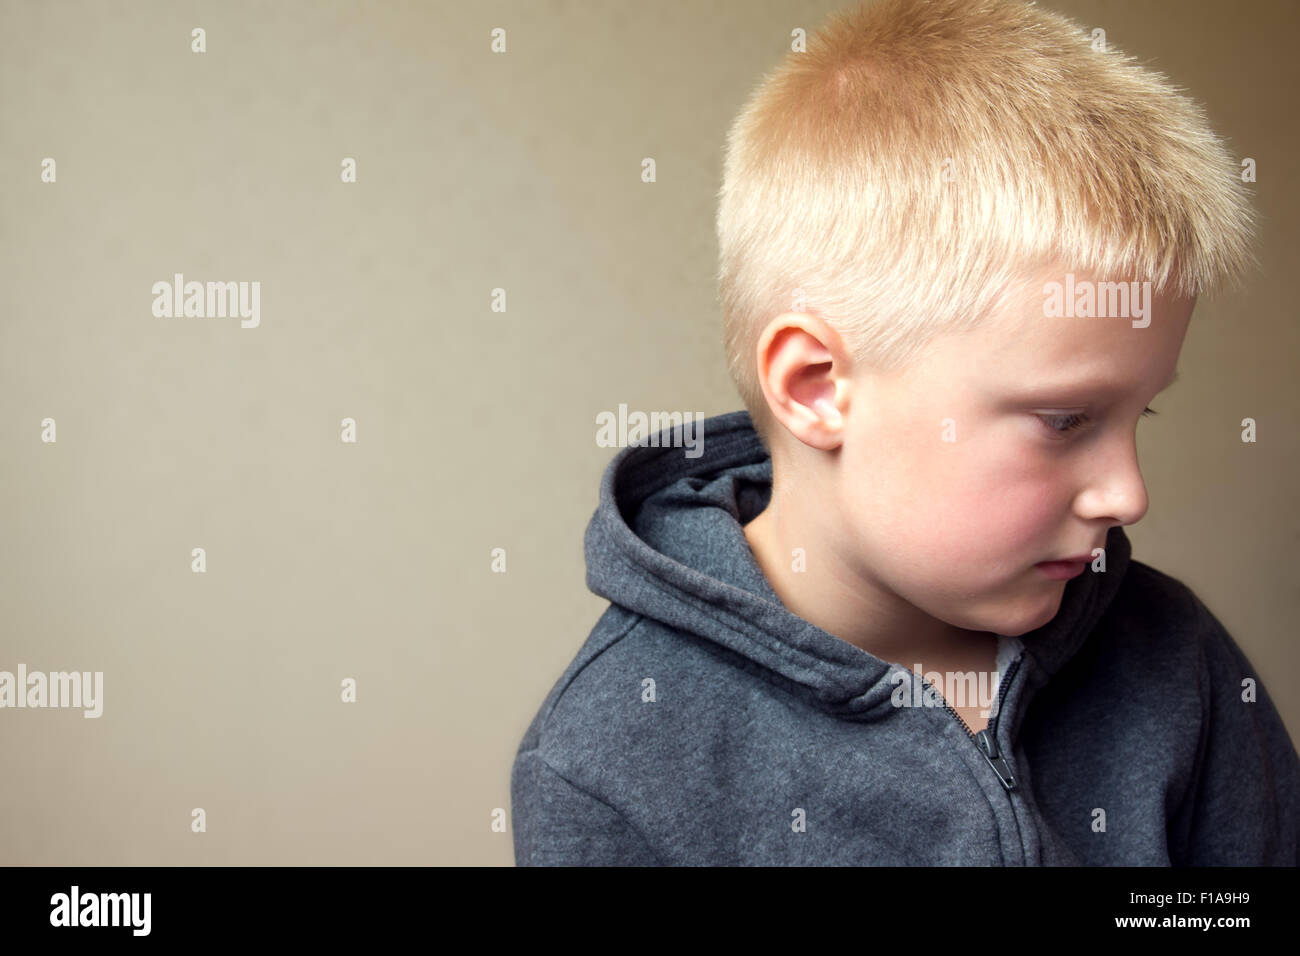 Angry upset sad child (boy, kid) portrait - Stock Image